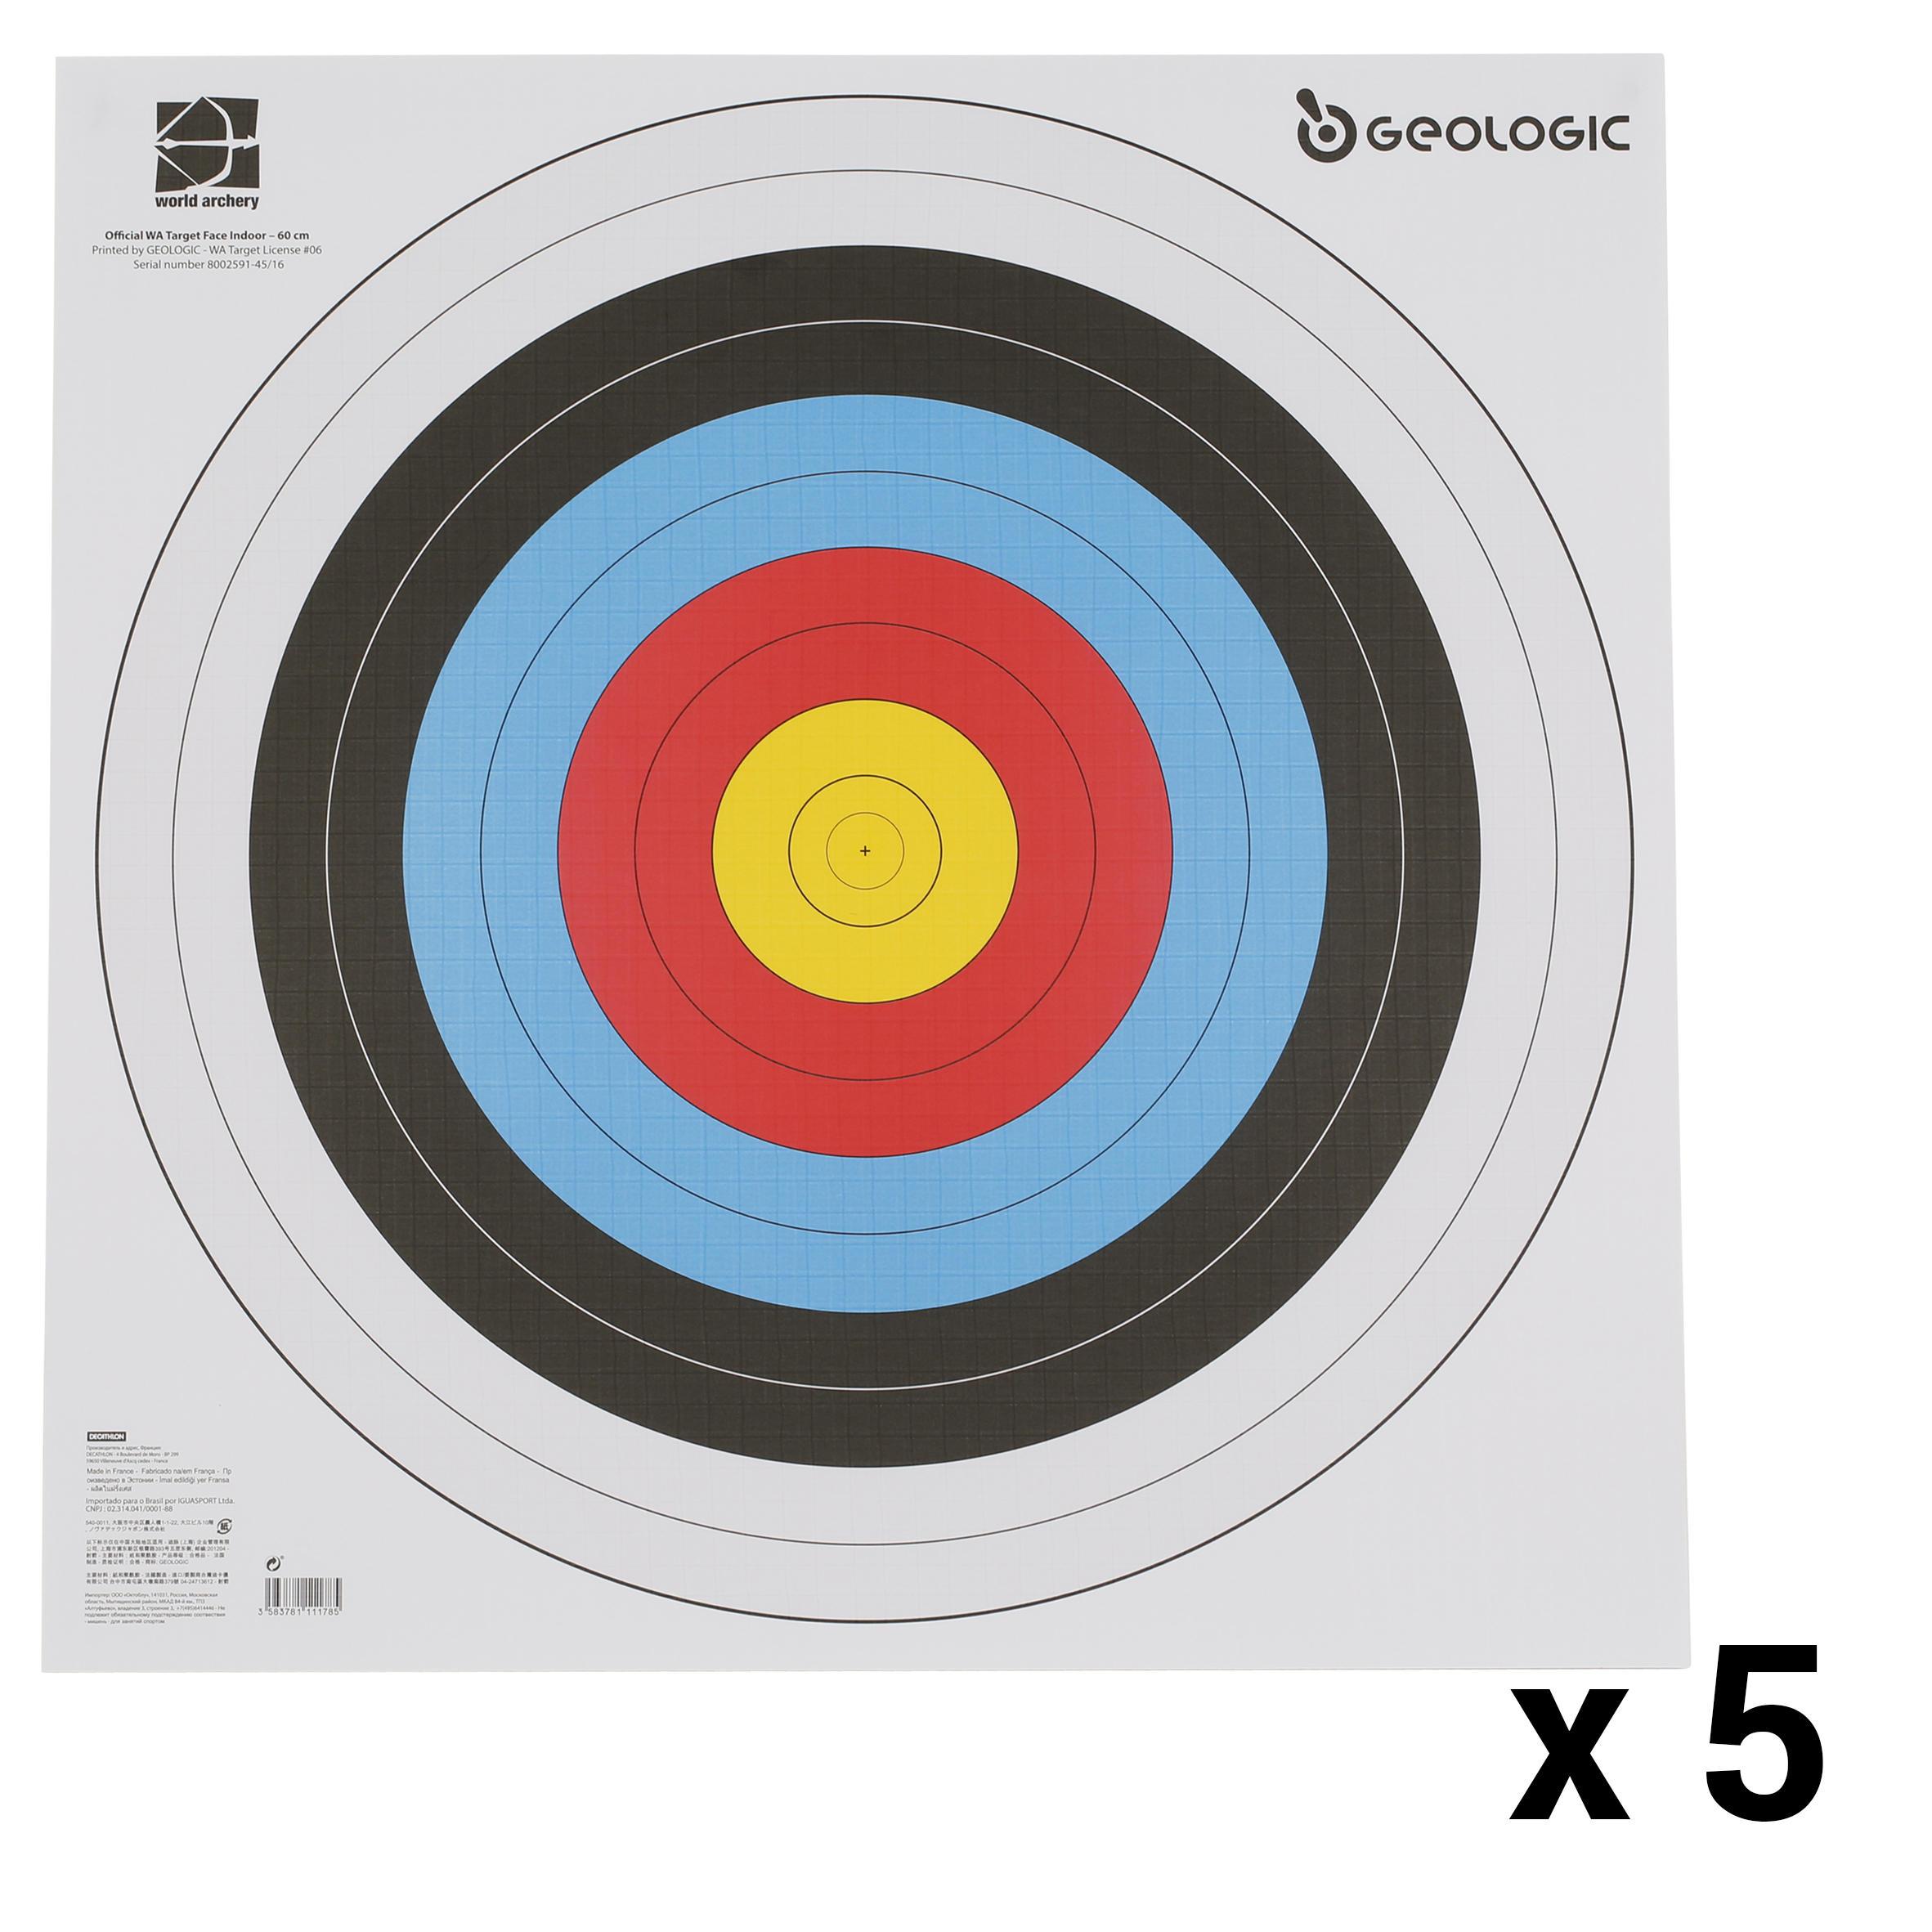 5 Ținte tir cu arcul 60x60 cm imagine